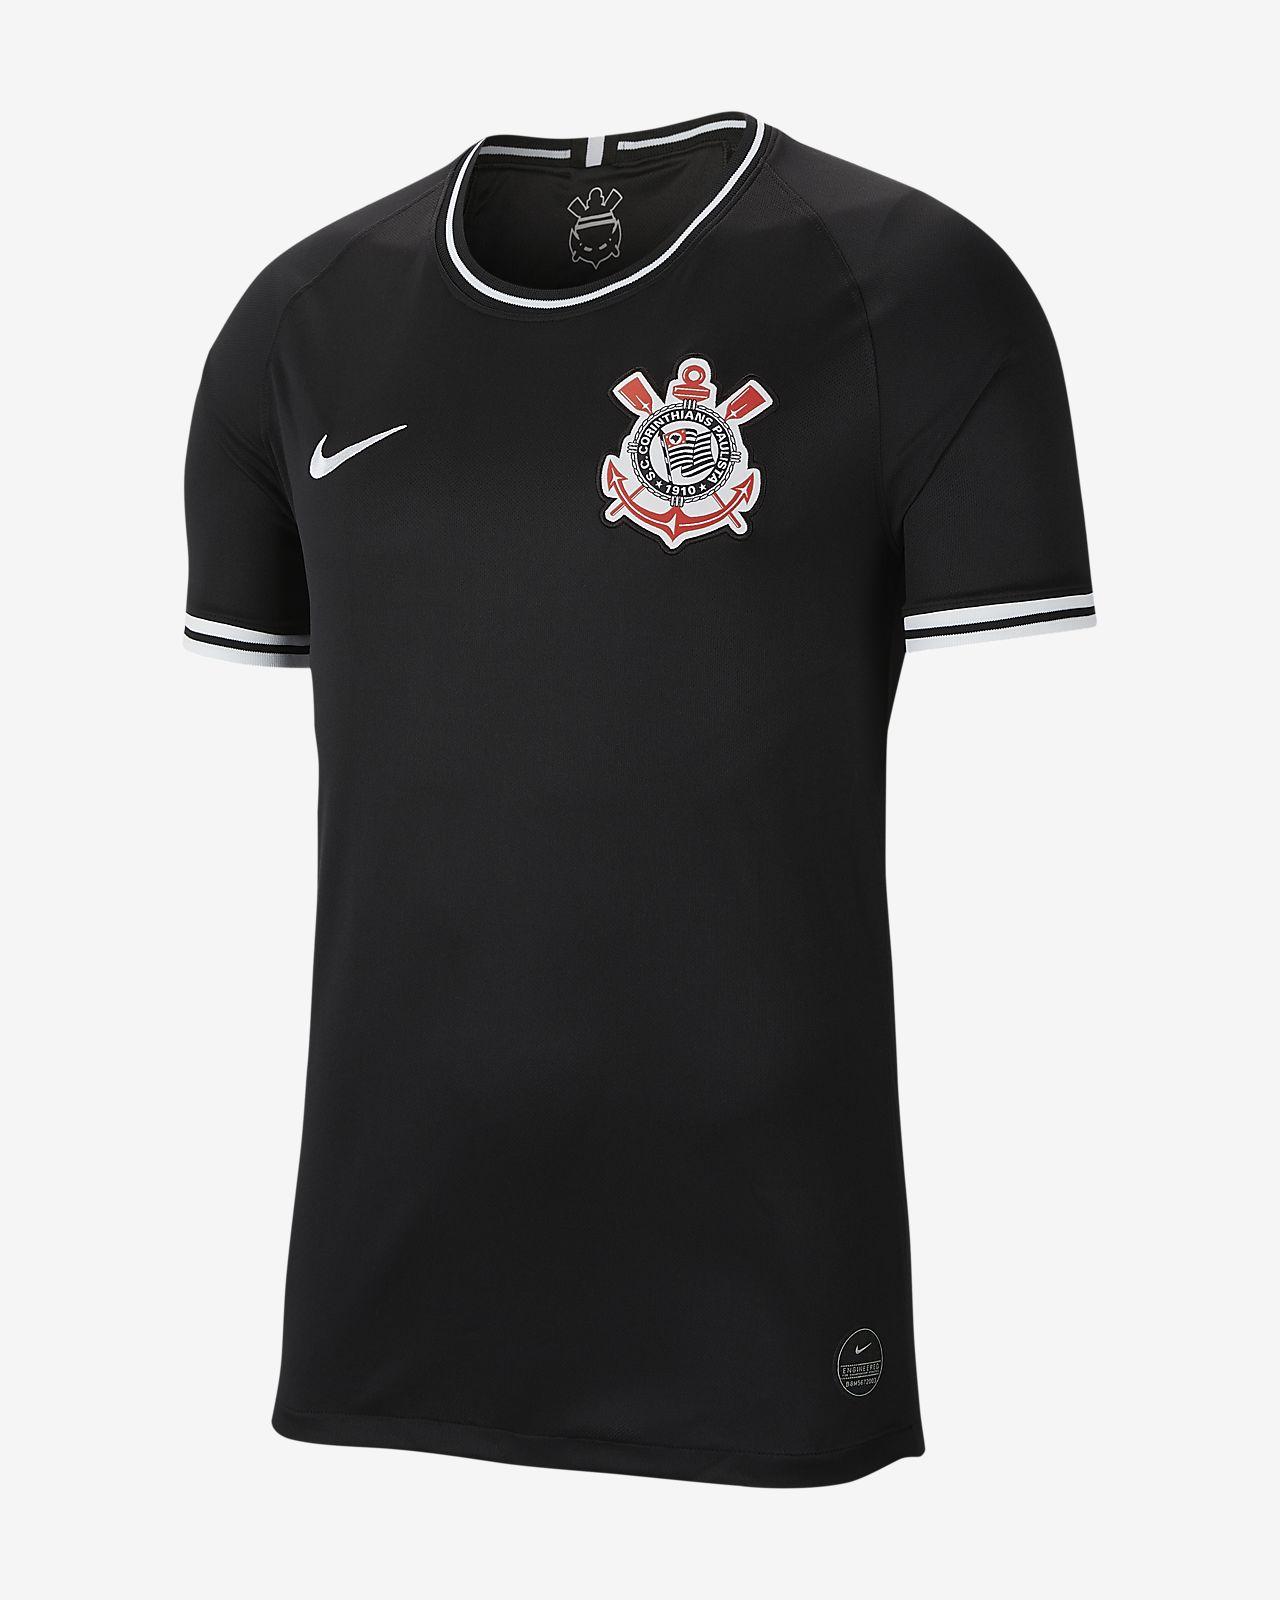 Męska wyjazdowa koszulka piłkarska S.C. Corinthians Stadium 2019/20